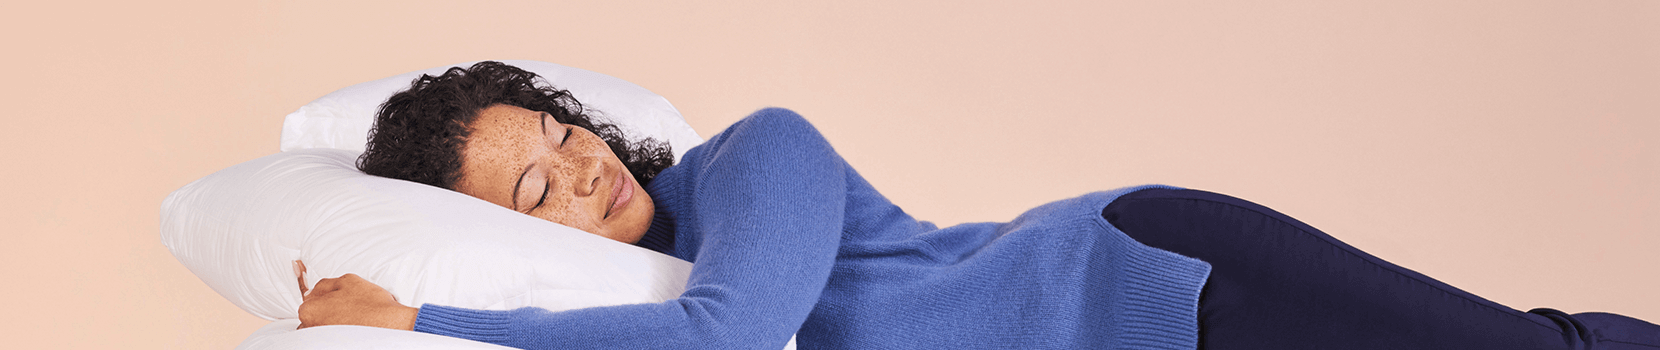 Mattress Guide : Pillows - Pillow Page - Image banner